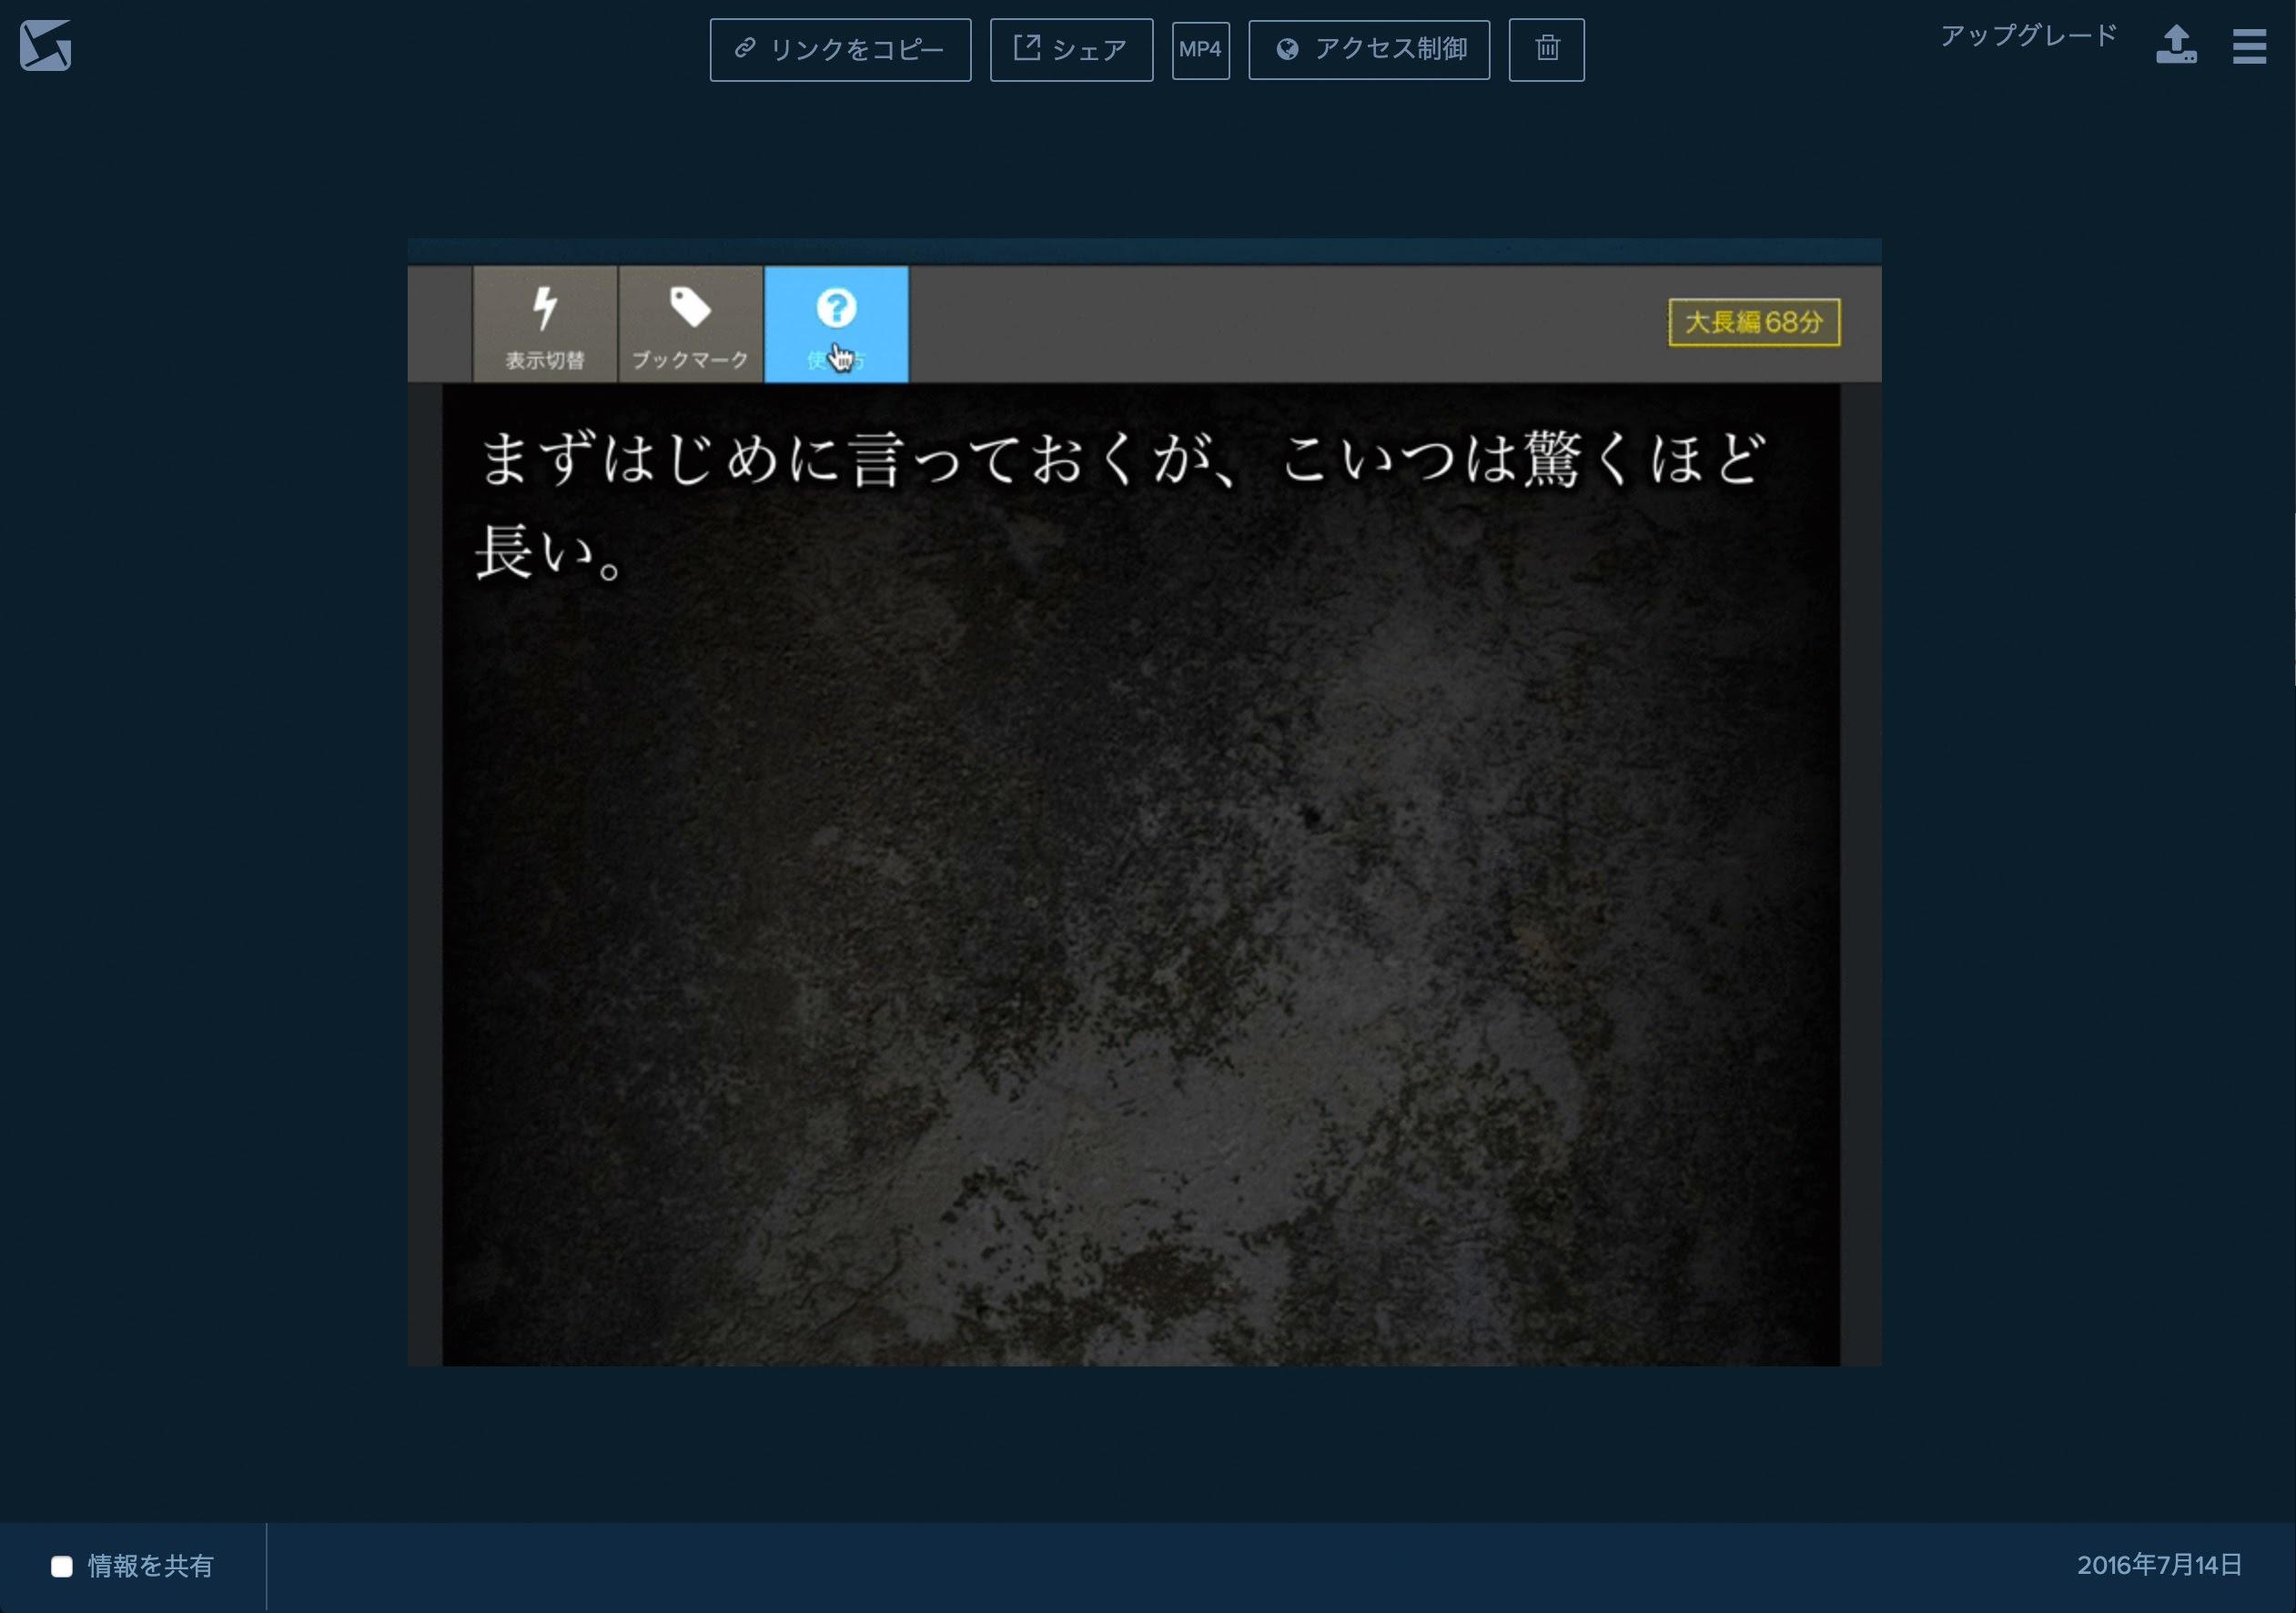 Gyazo GIF アップロード完了 image md